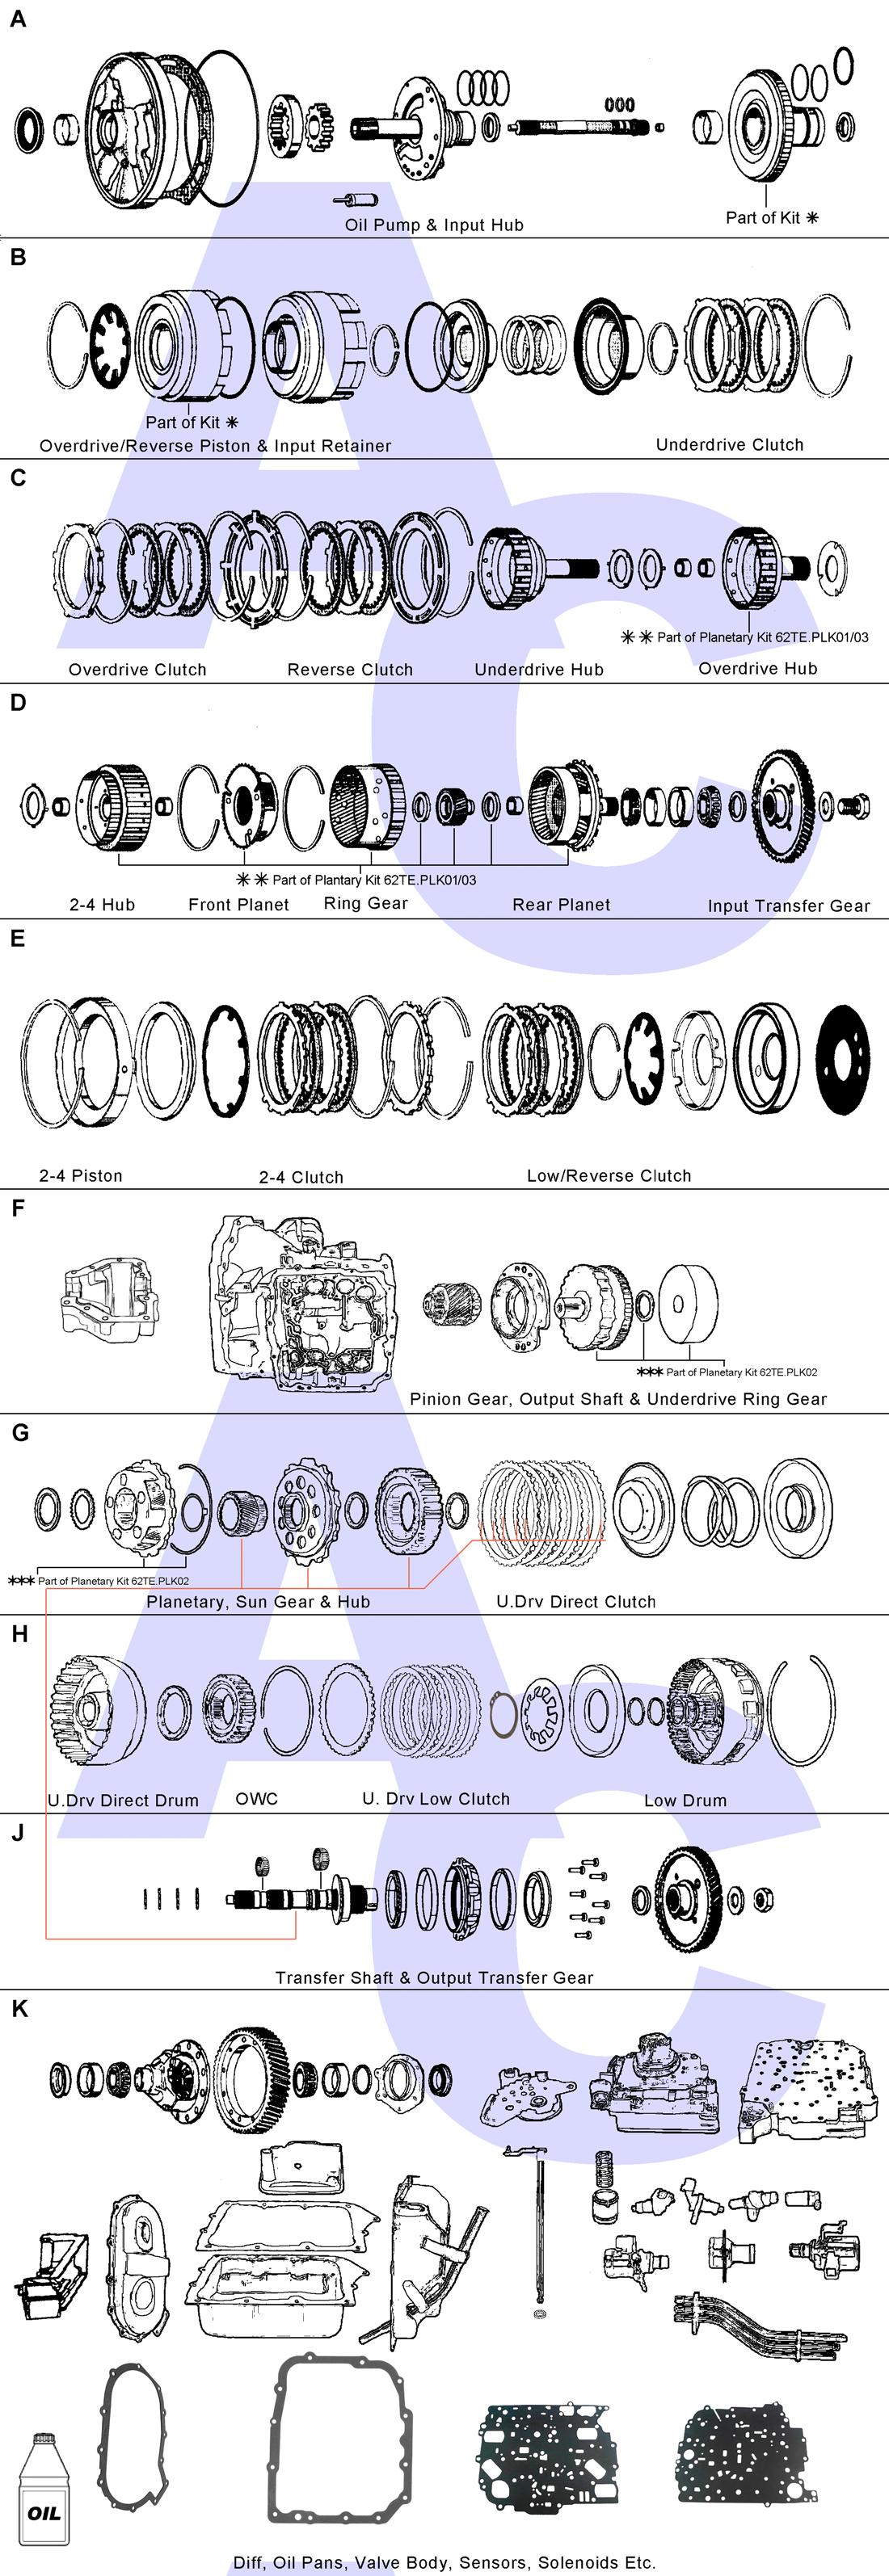 62TE Automatic Transmission Parts Catalogue - Automatic Choice